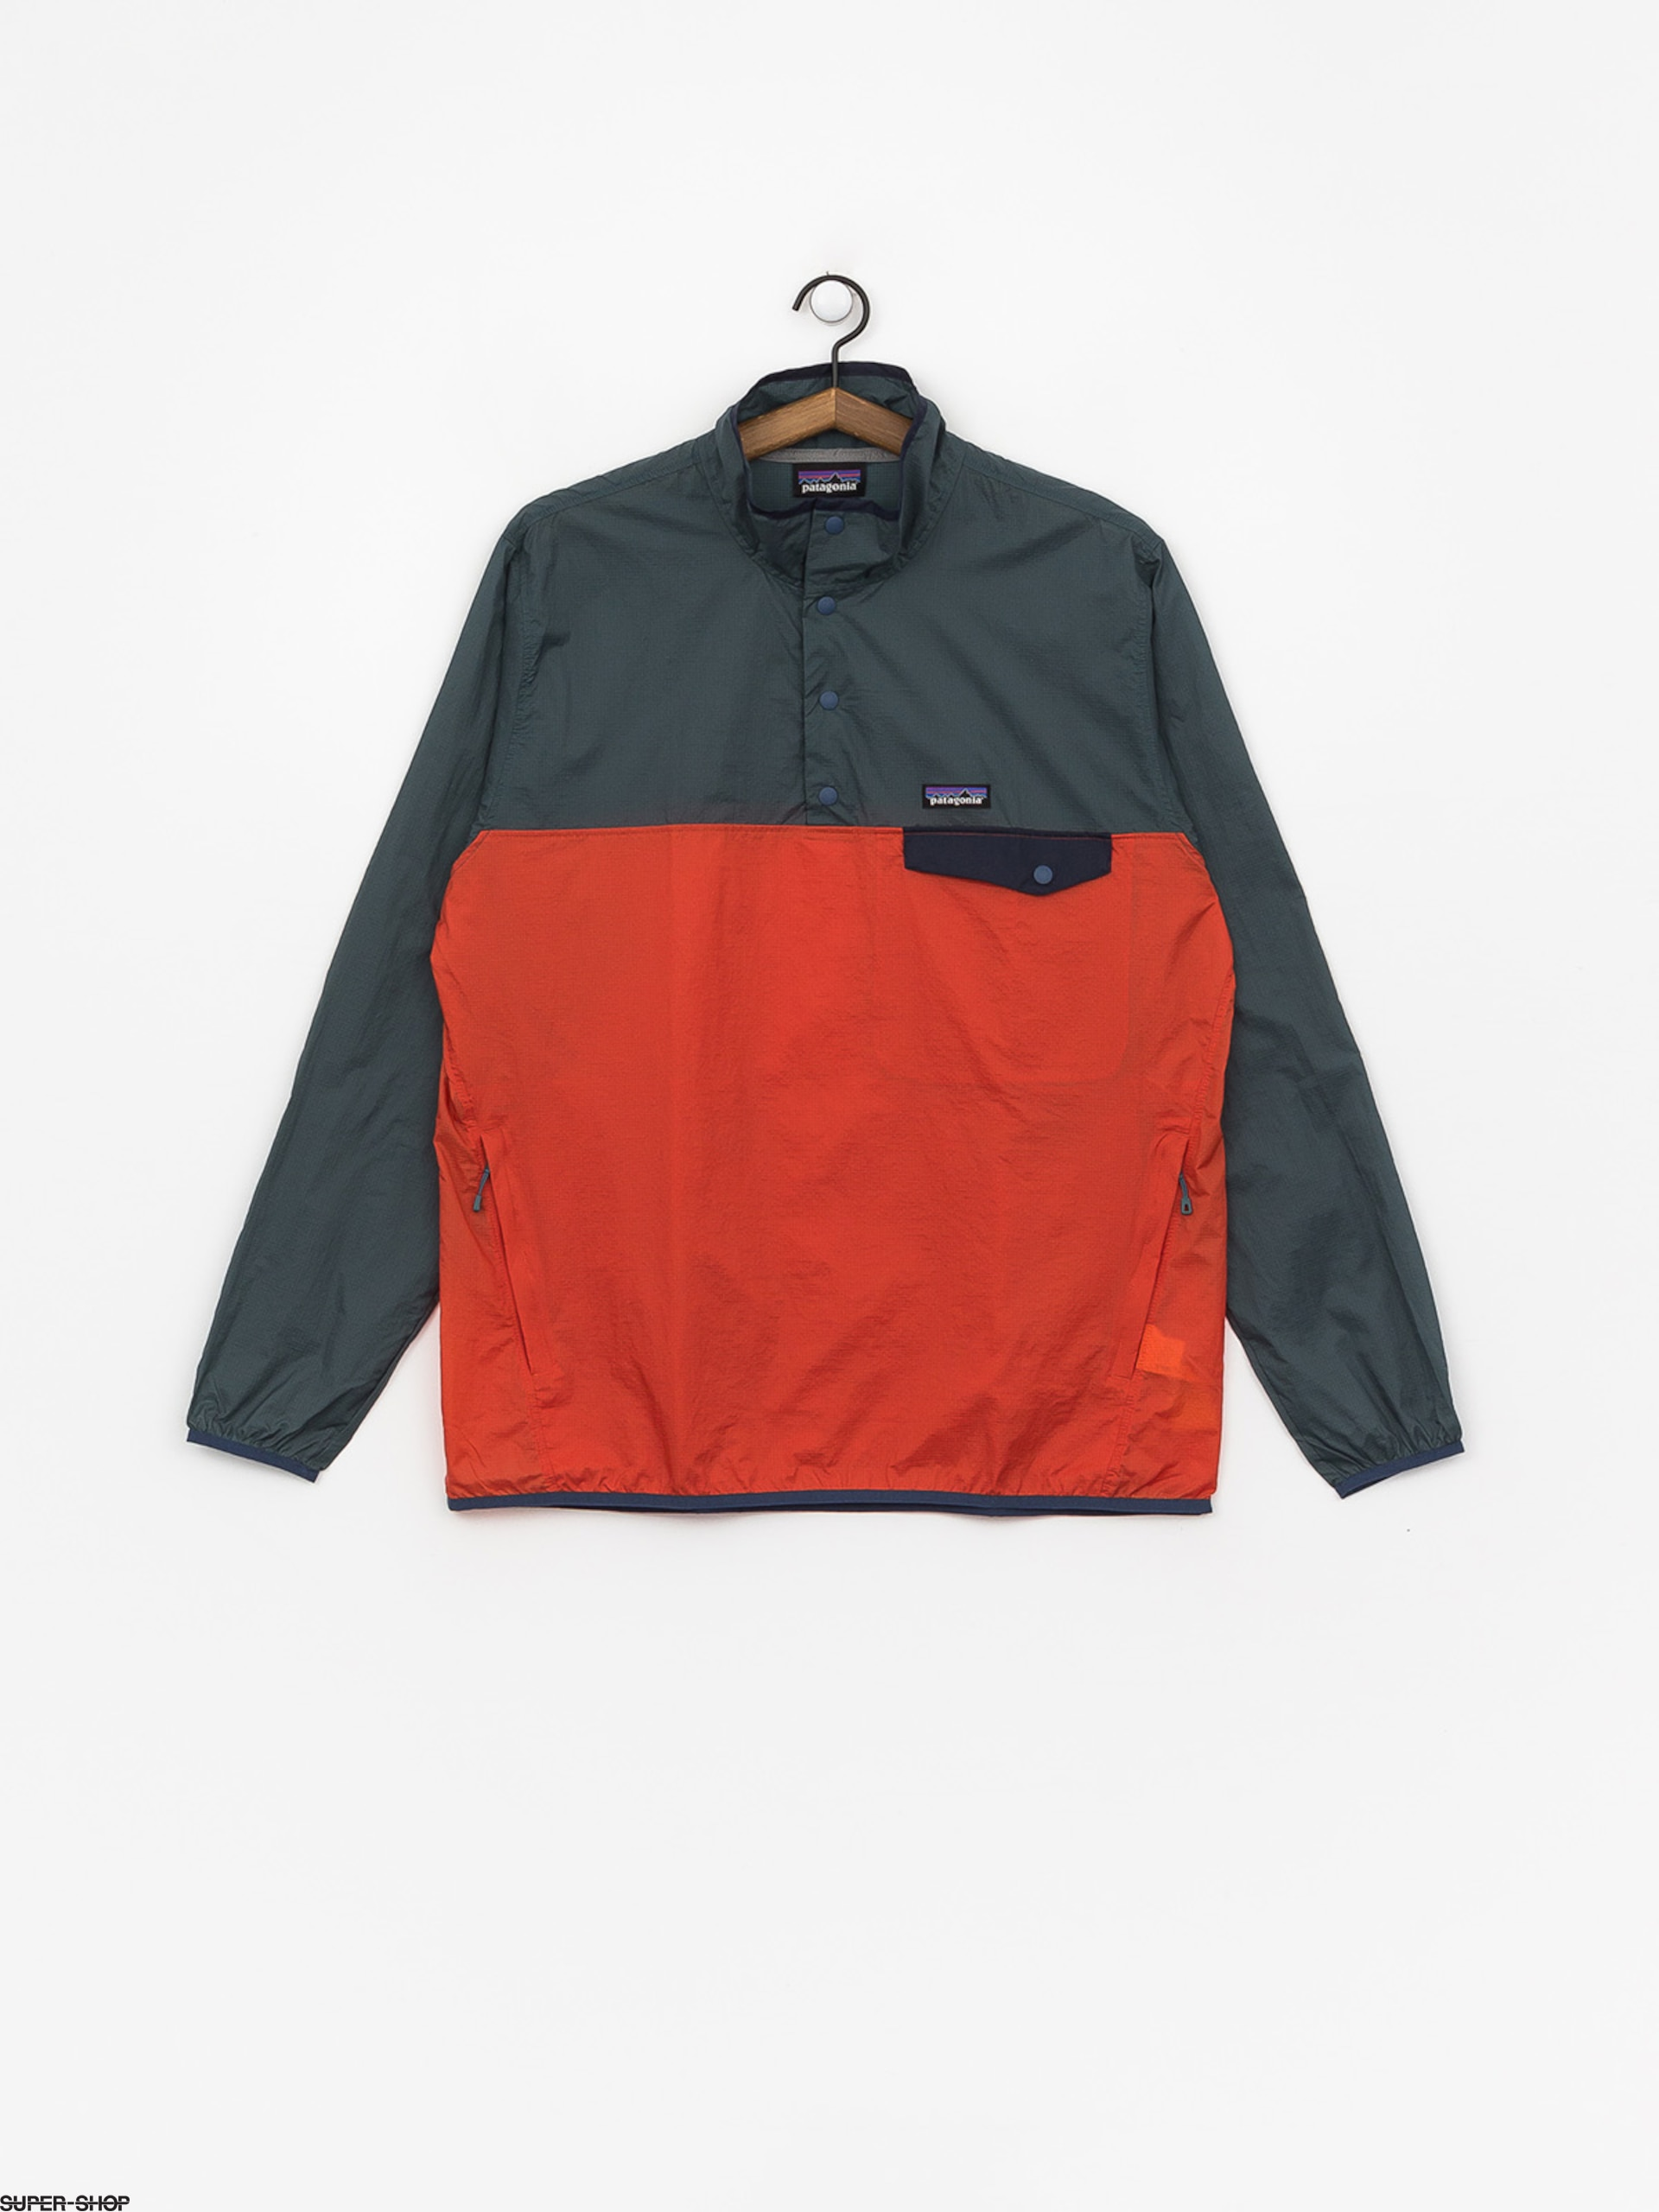 5f6d6f16f1fc7 1017331-w1920-patagonia-houdini-snap-t-jacket-sunset-orange.jpg